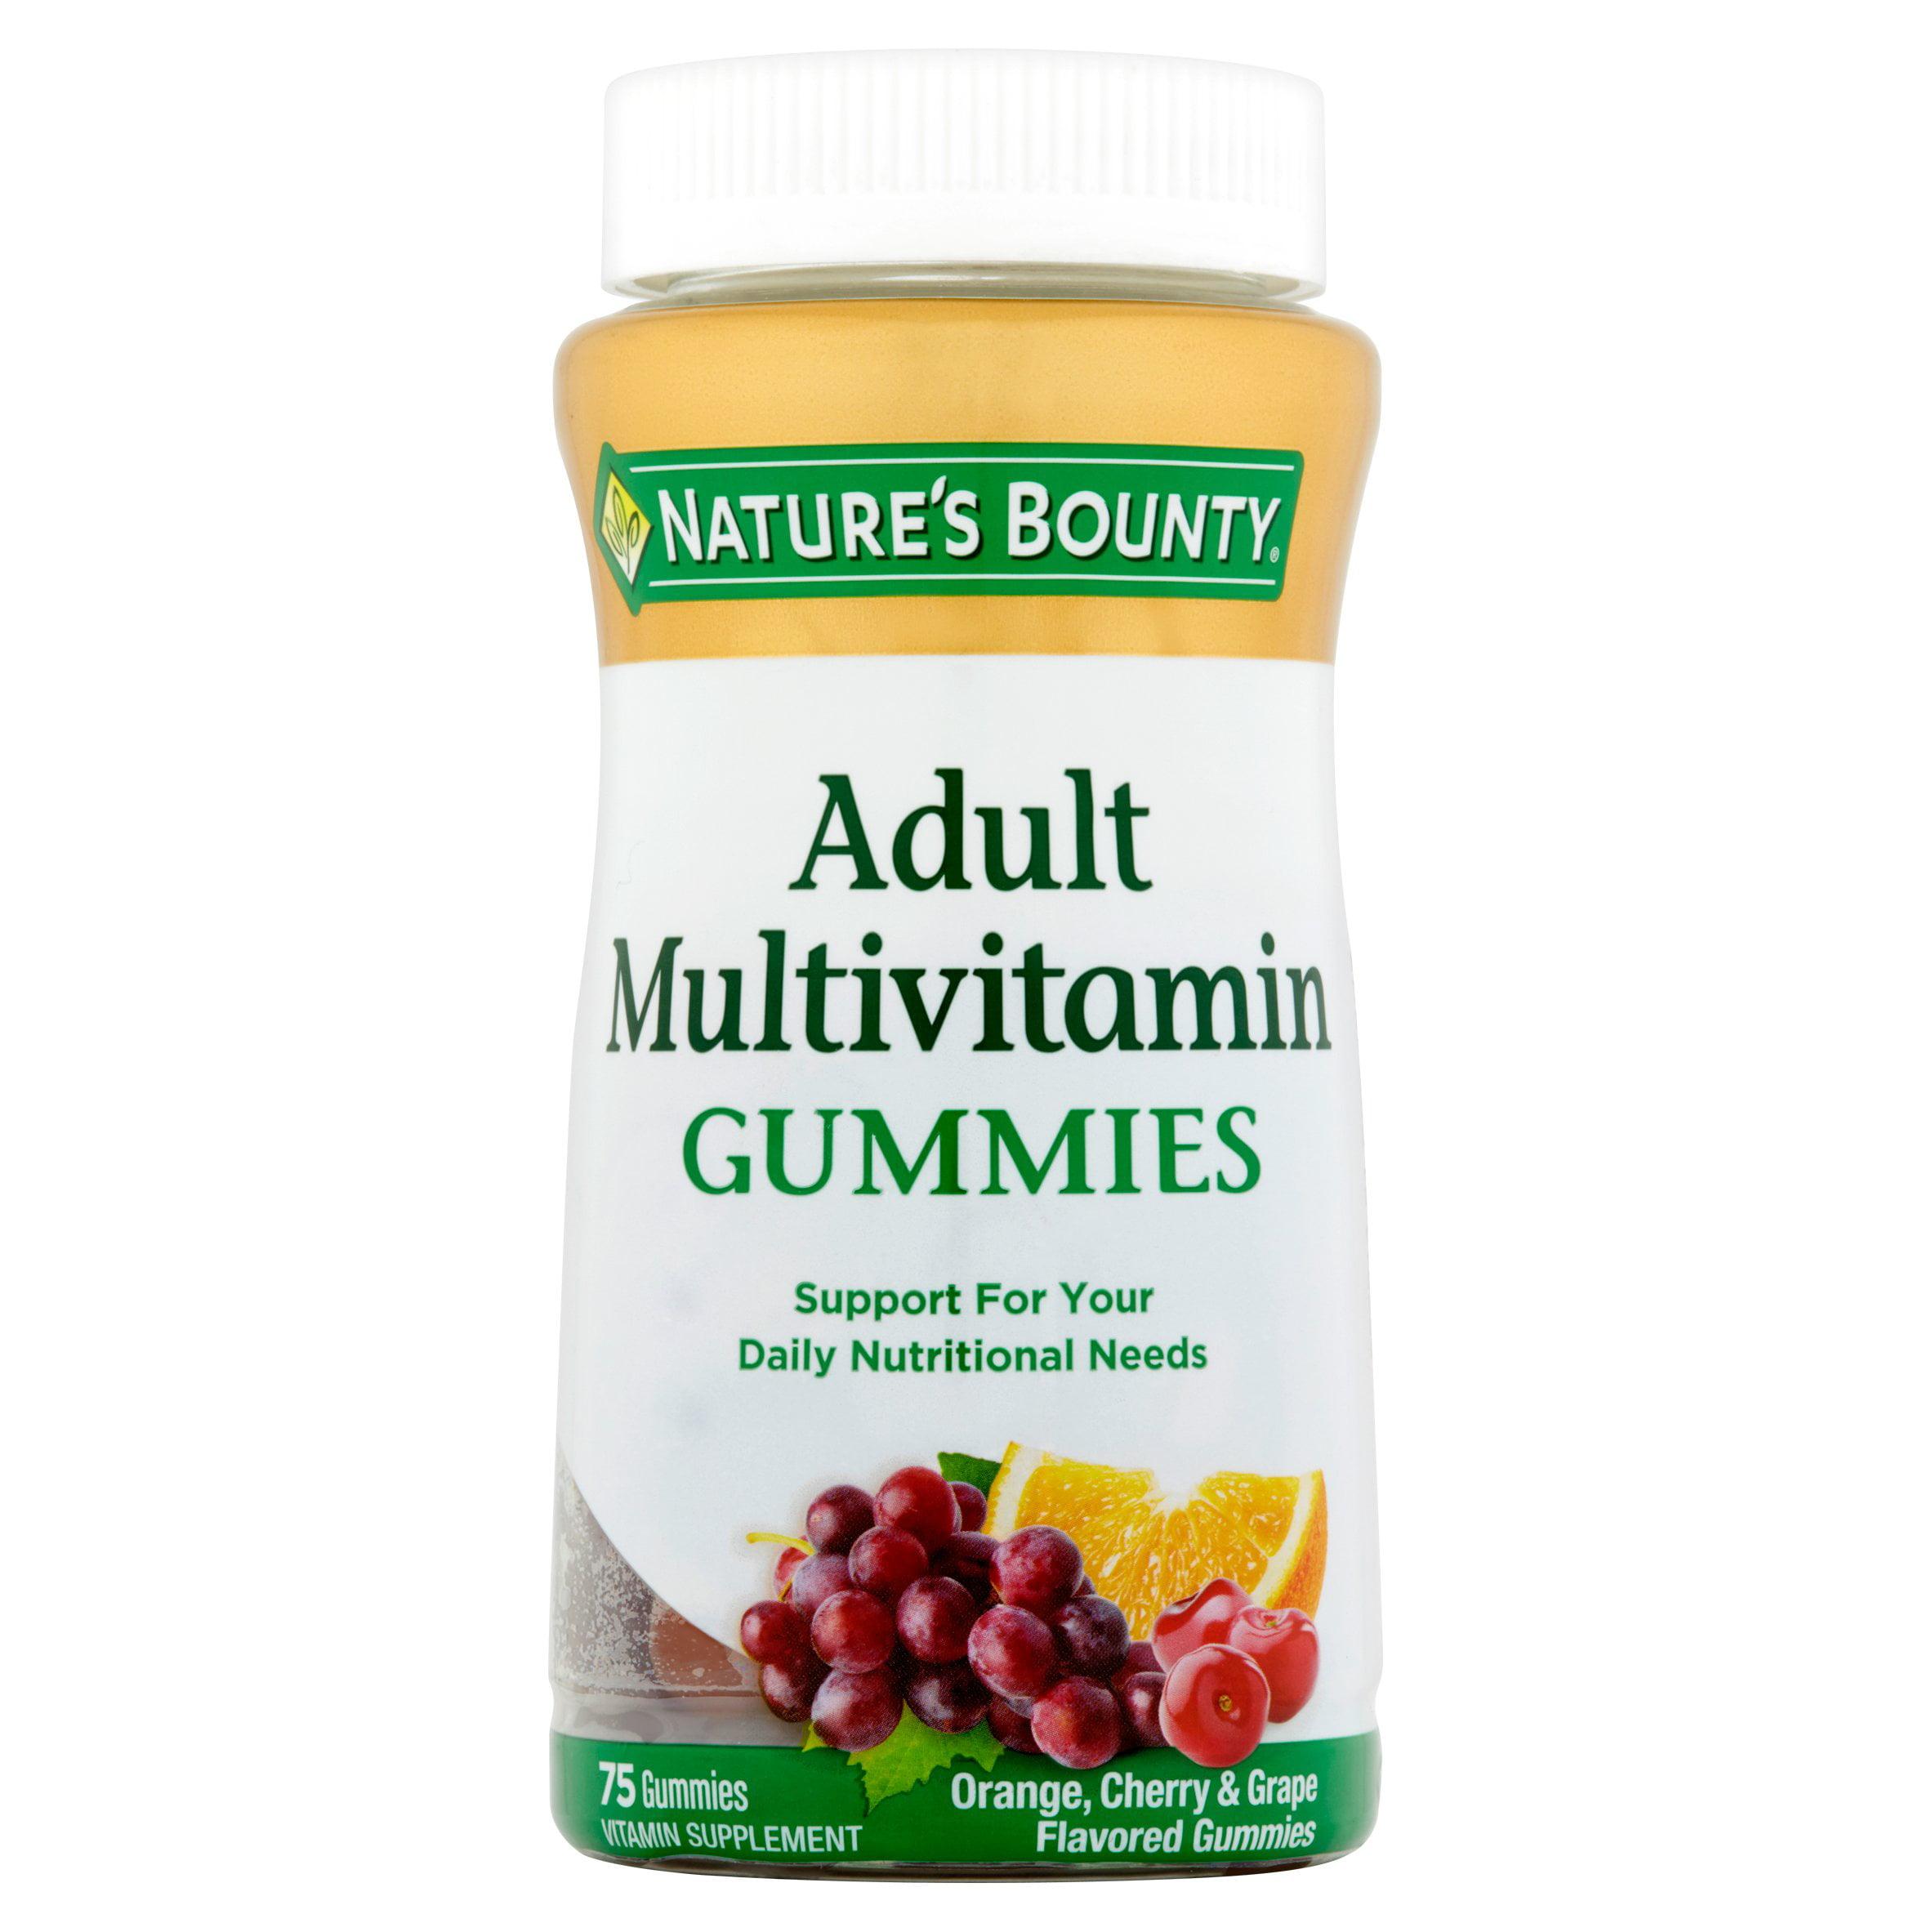 Nature's Bounty Adult Multivitamin Orange, Cherry & Grape Flavored Gummies, 75 count